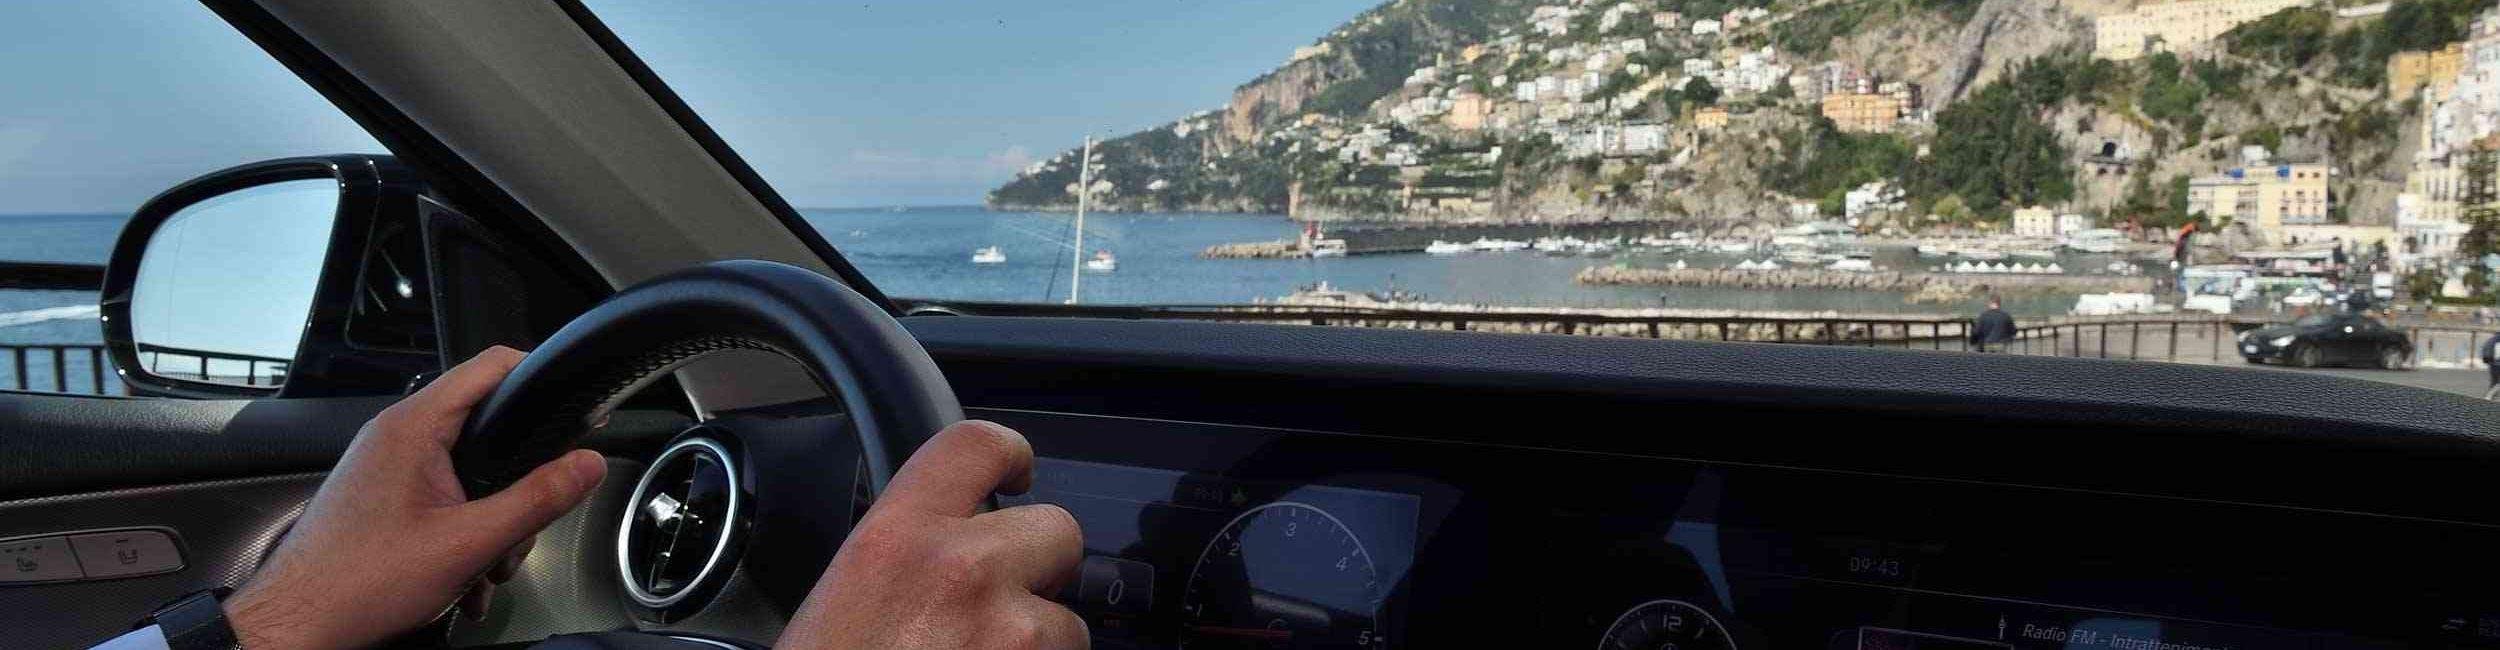 Amalfi-Car---Luxury-Car-Service